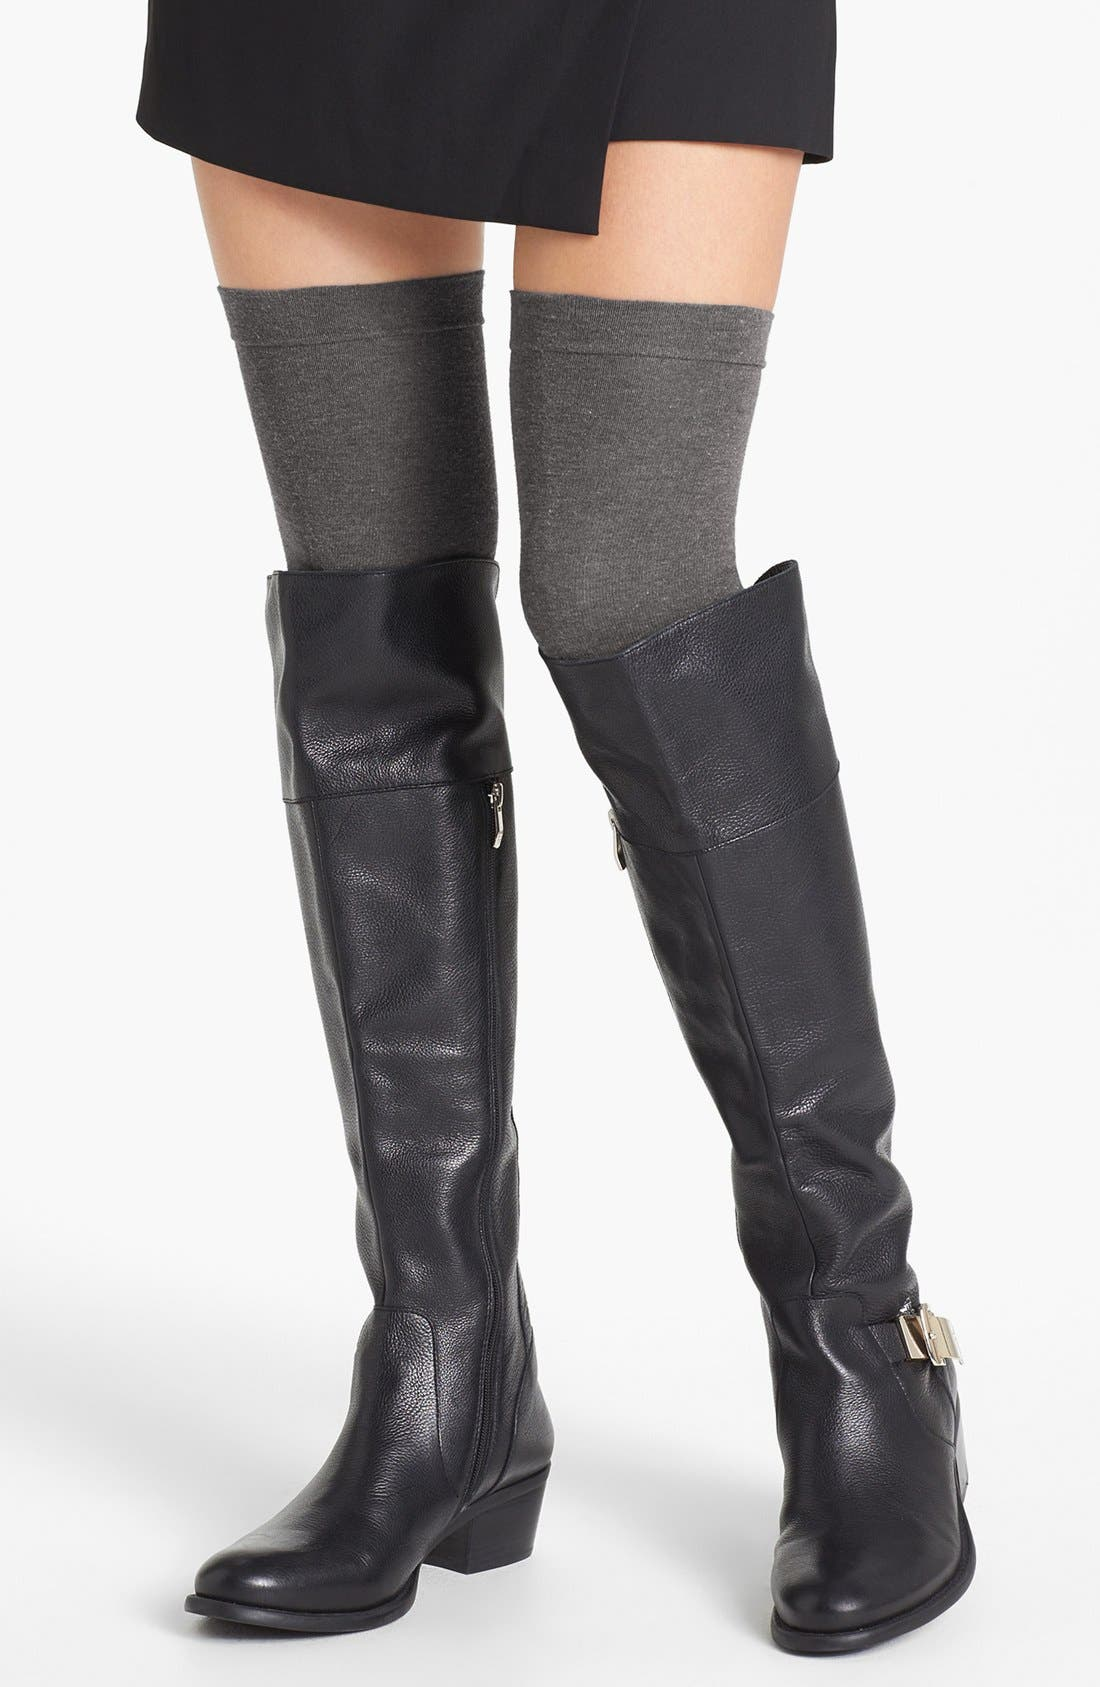 Main Image - Hue 'Tall & Skinny' Over the Knee Socks